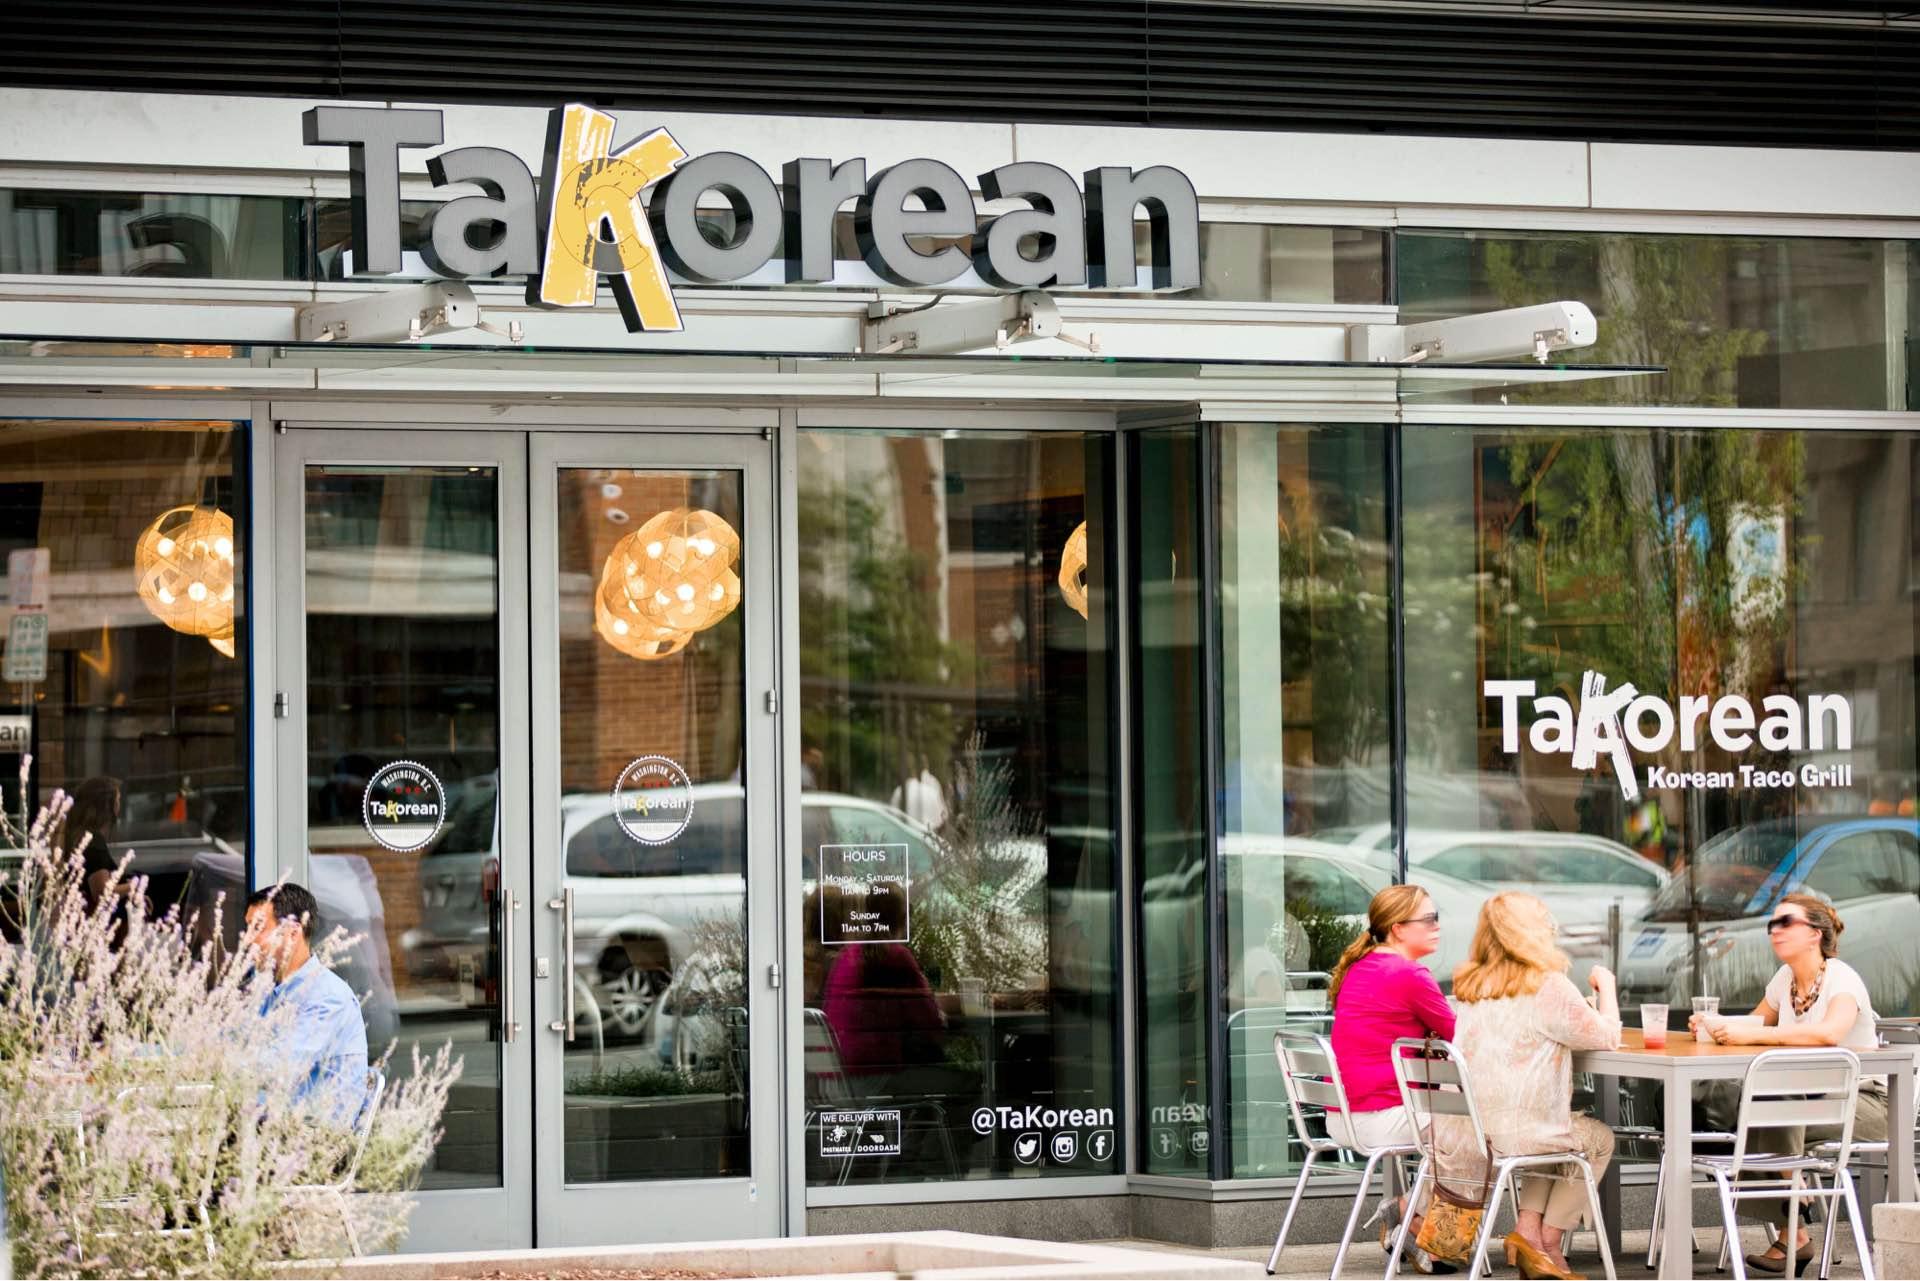 Walk to TakoRean, a DC dining hotspot.